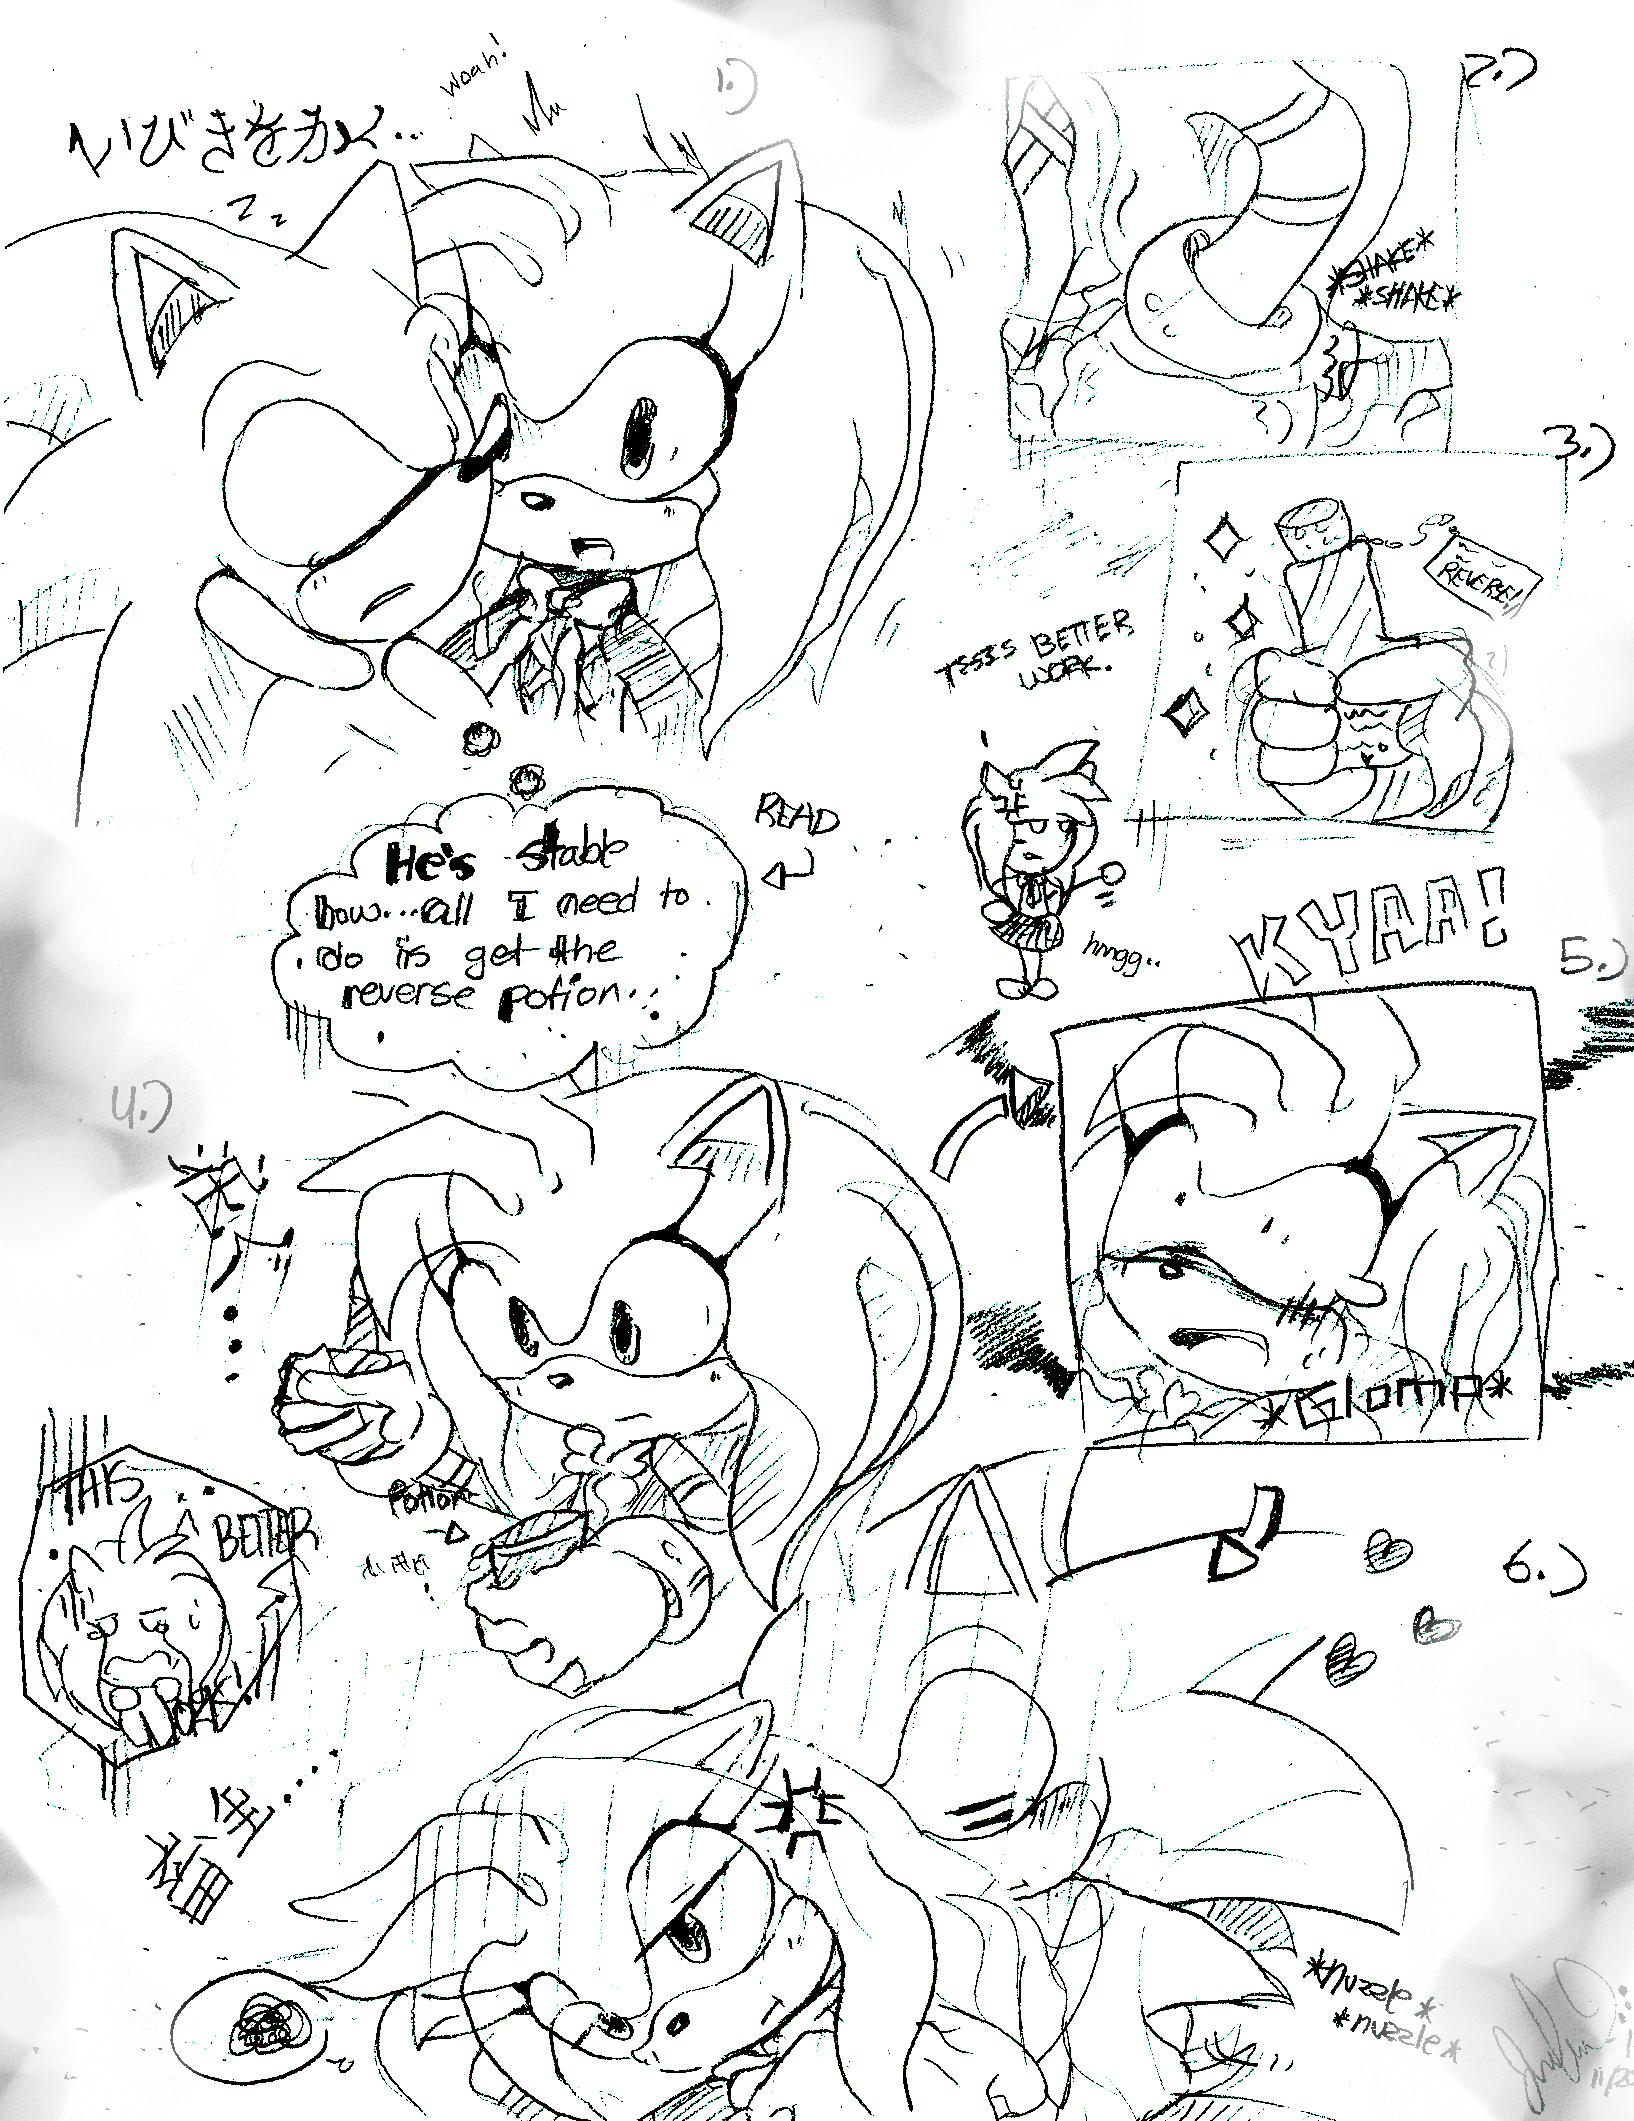 Manga Sketch Test by chippuuuu